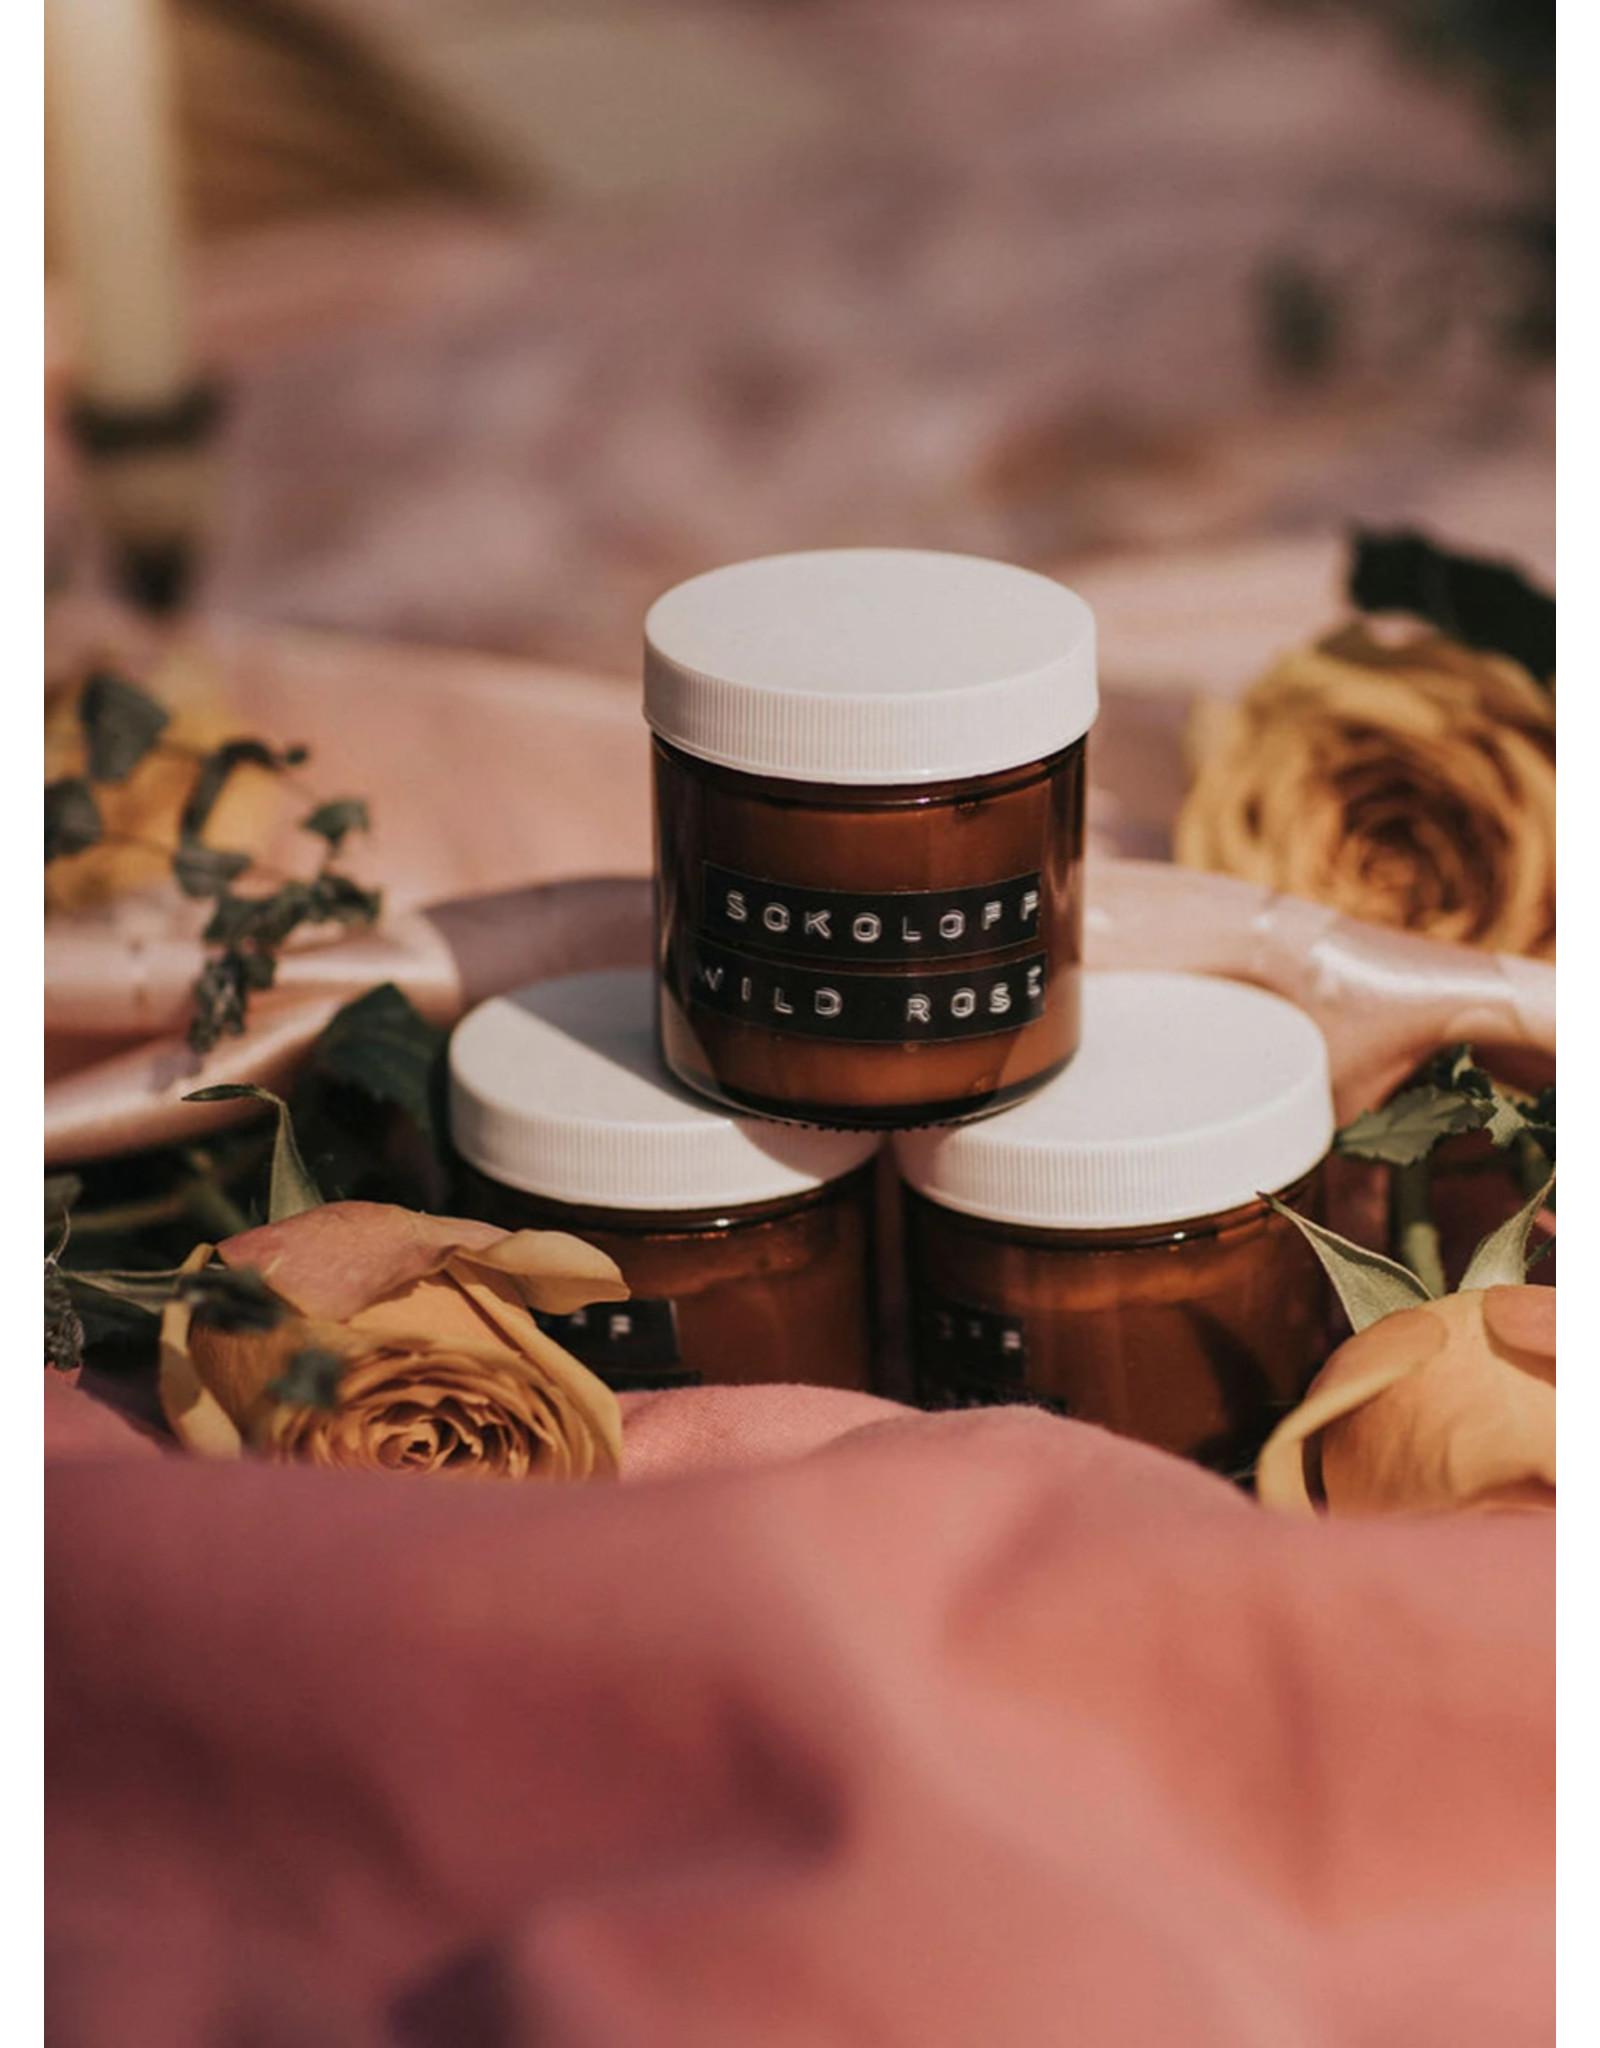 Sokoloff Crème corporelle Rose